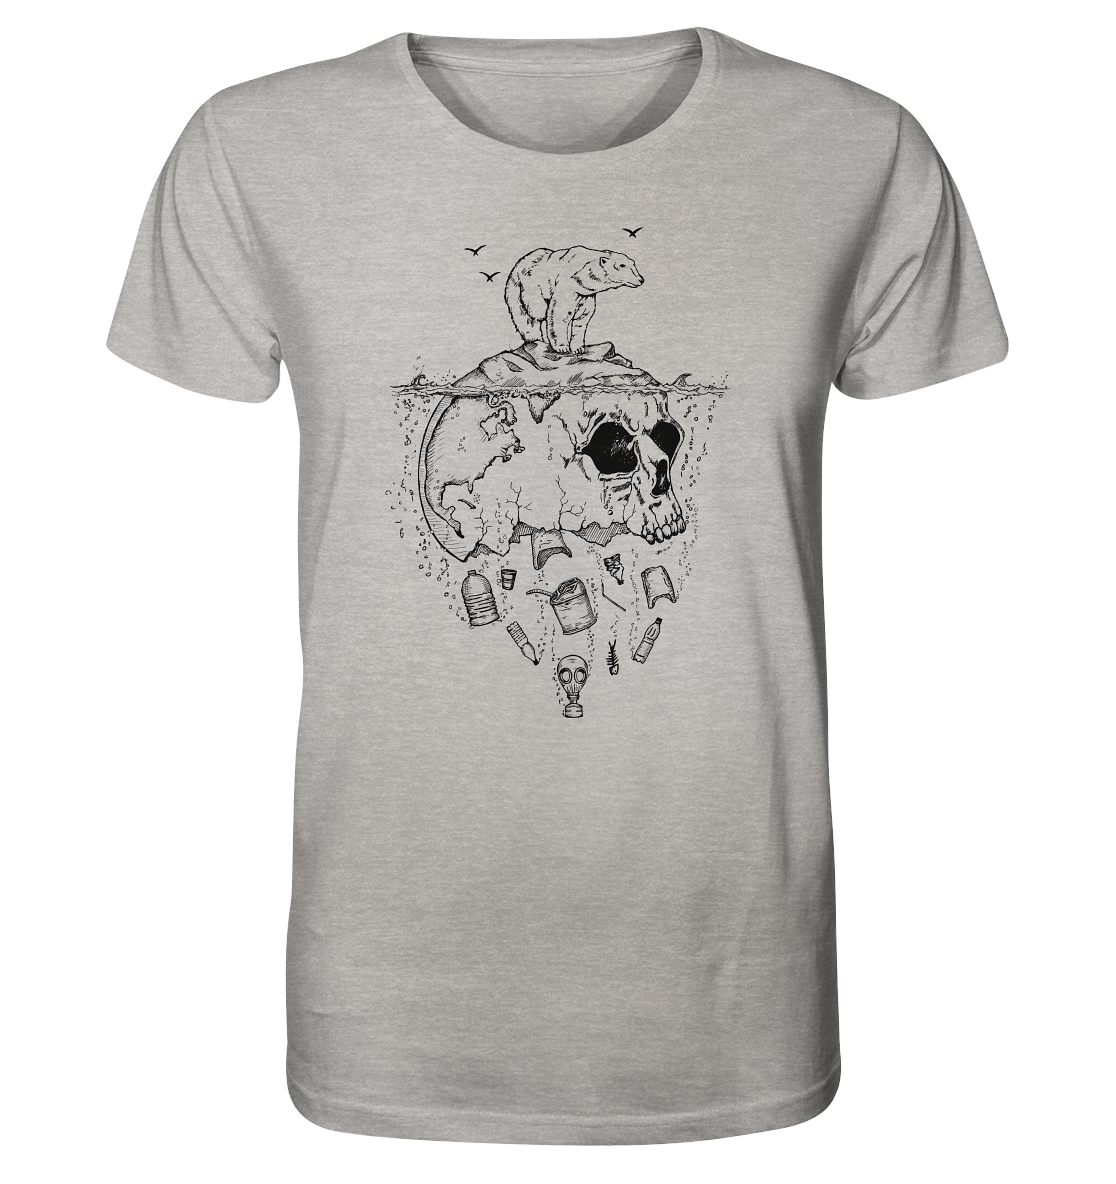 front-organic-shirt-meliert-c2c1c0-1116x-3.png